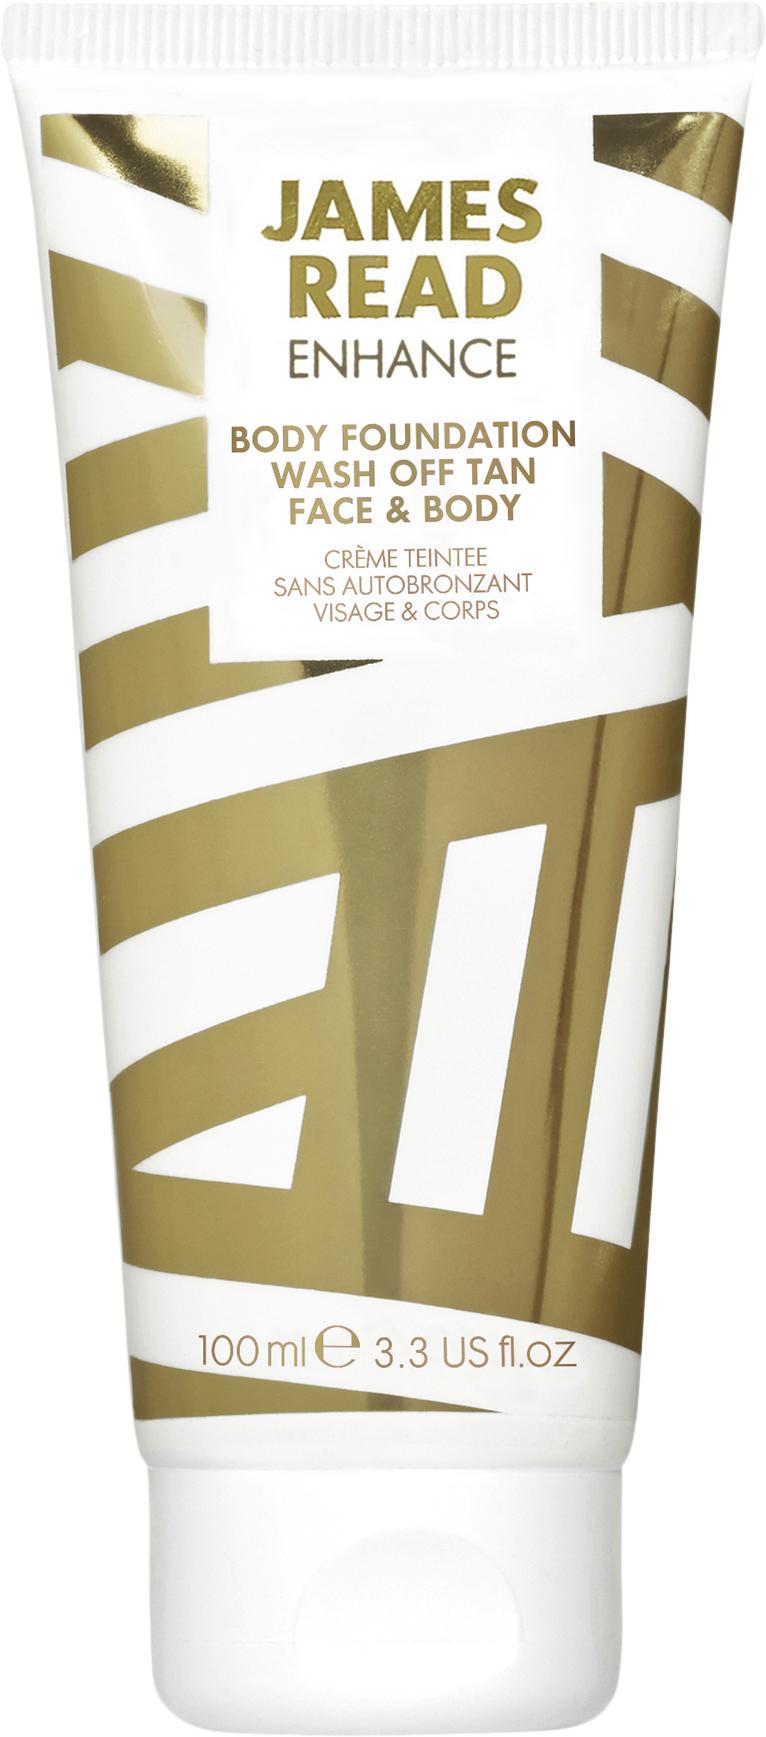 James Read - Body Foundation Wash Off Tan Face & Body 100 ml